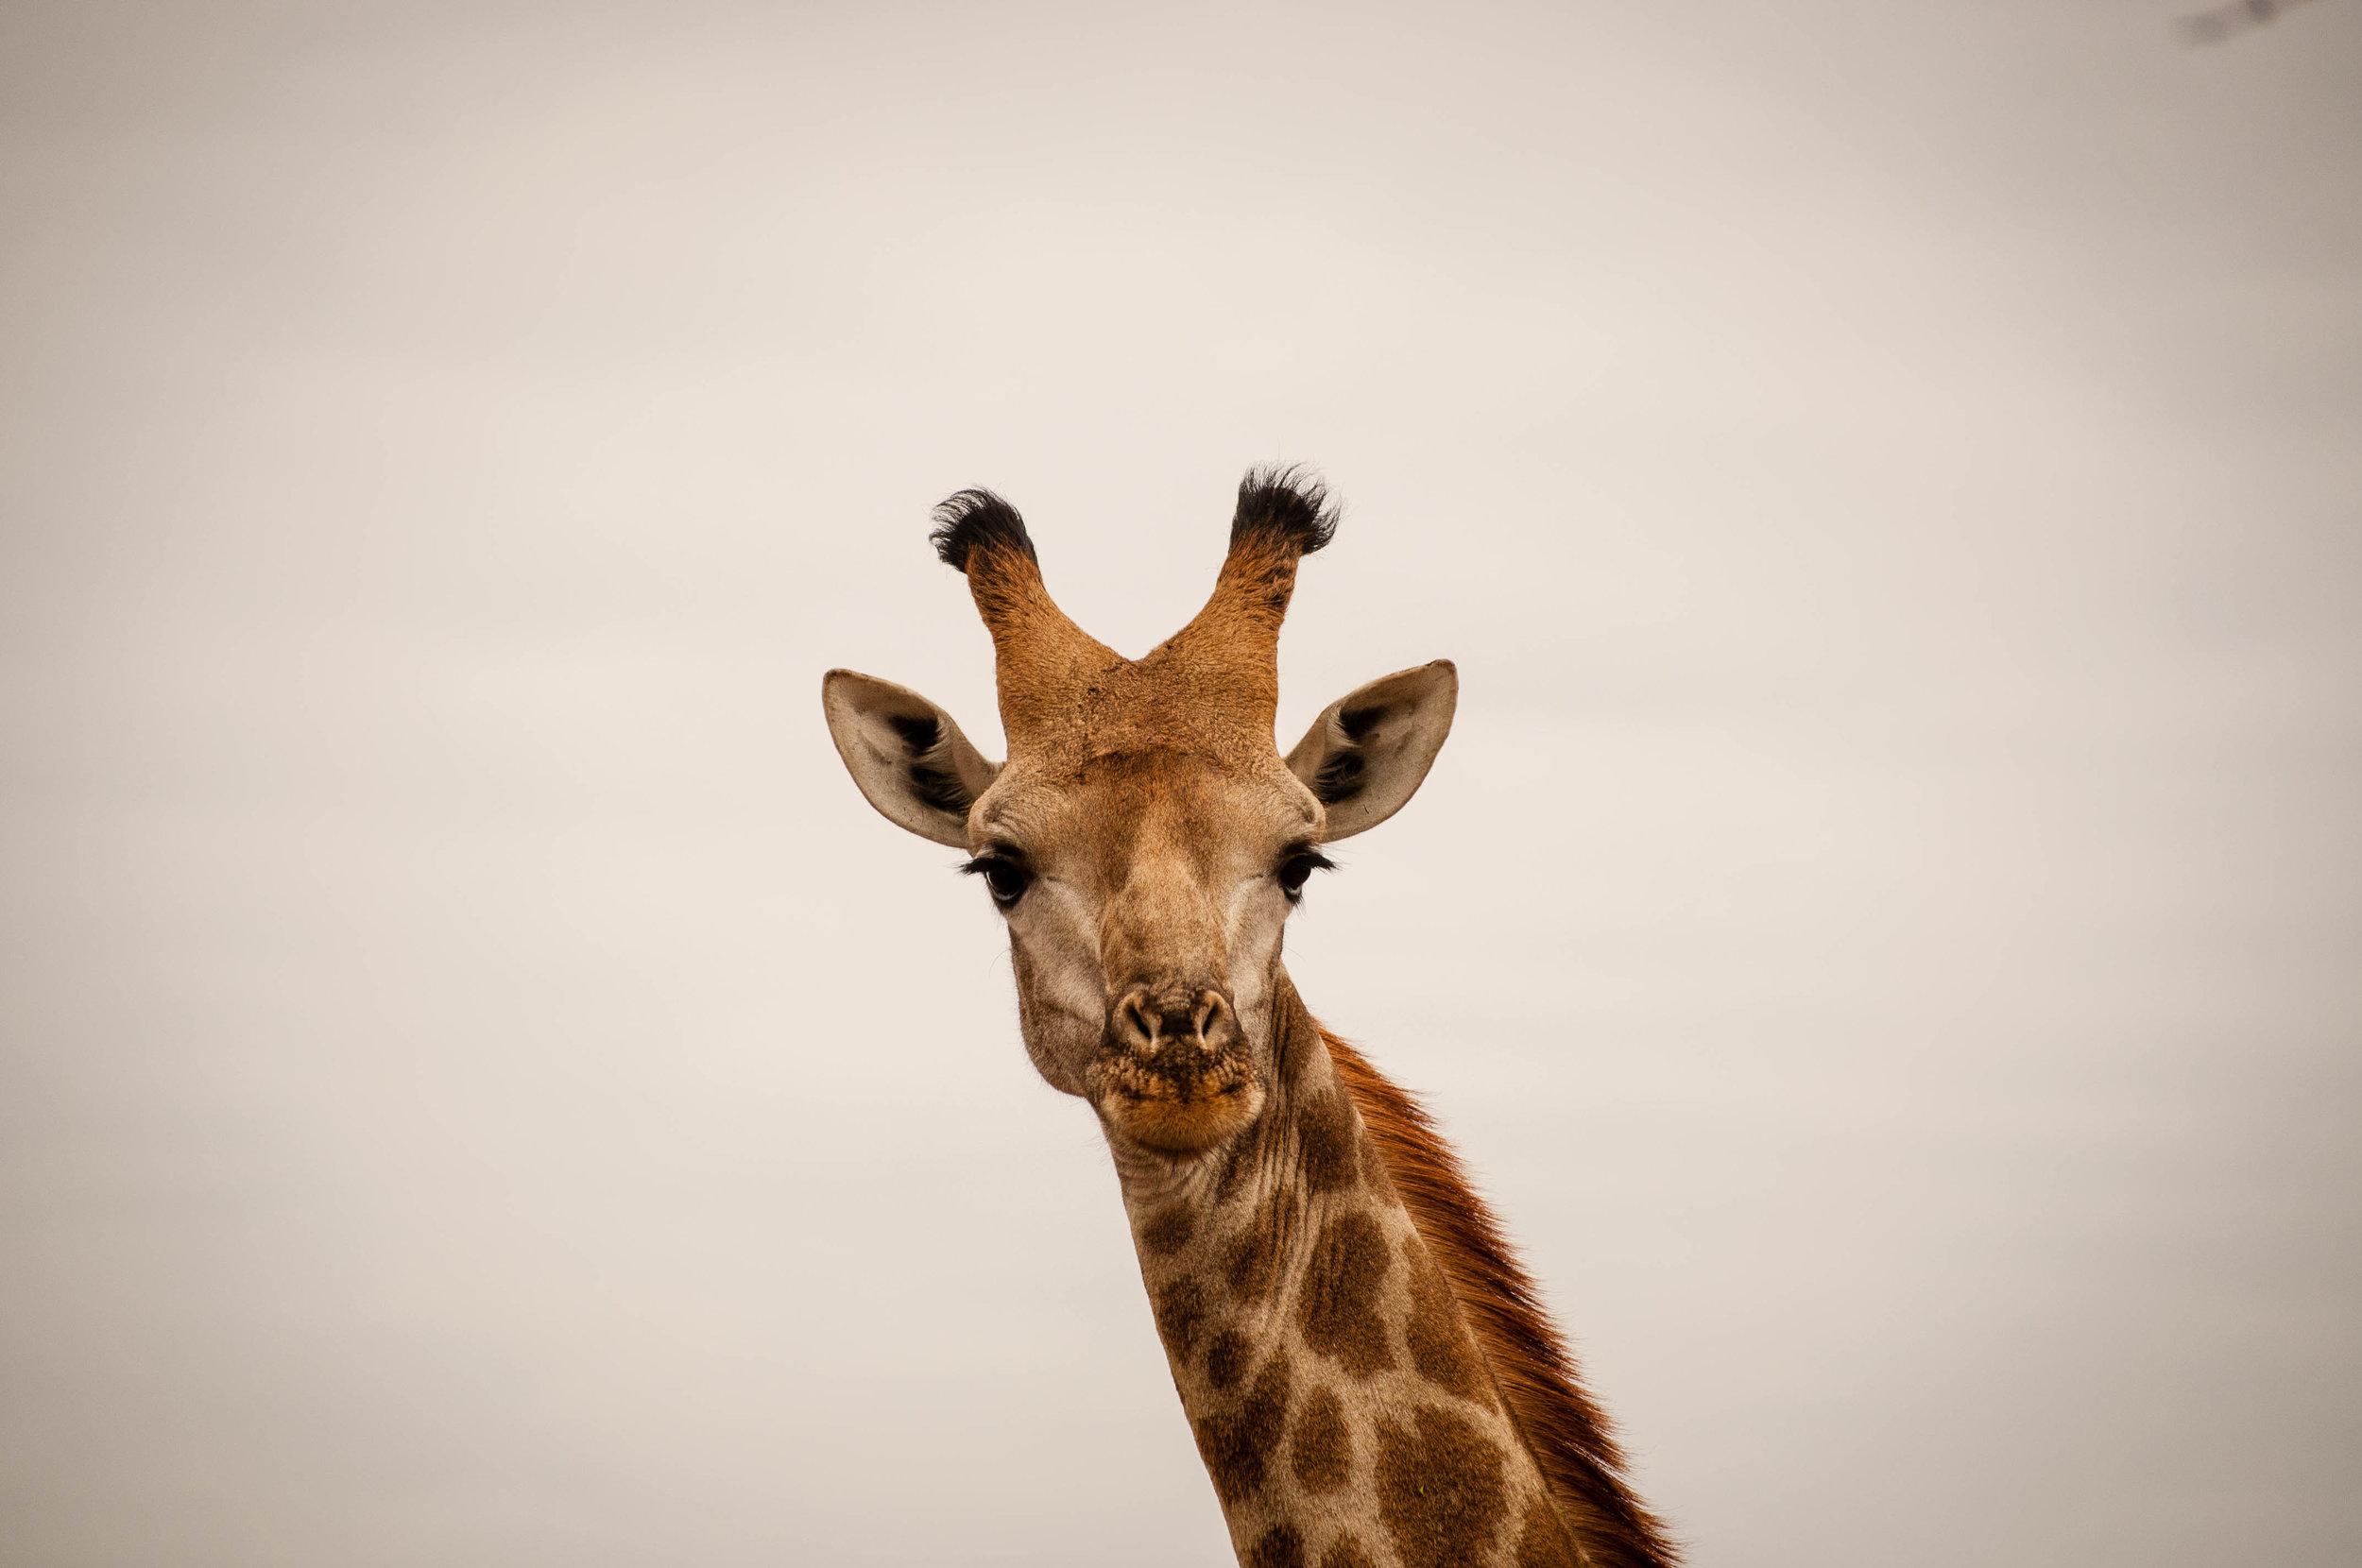 Giraffe at Kruger park. safari planner